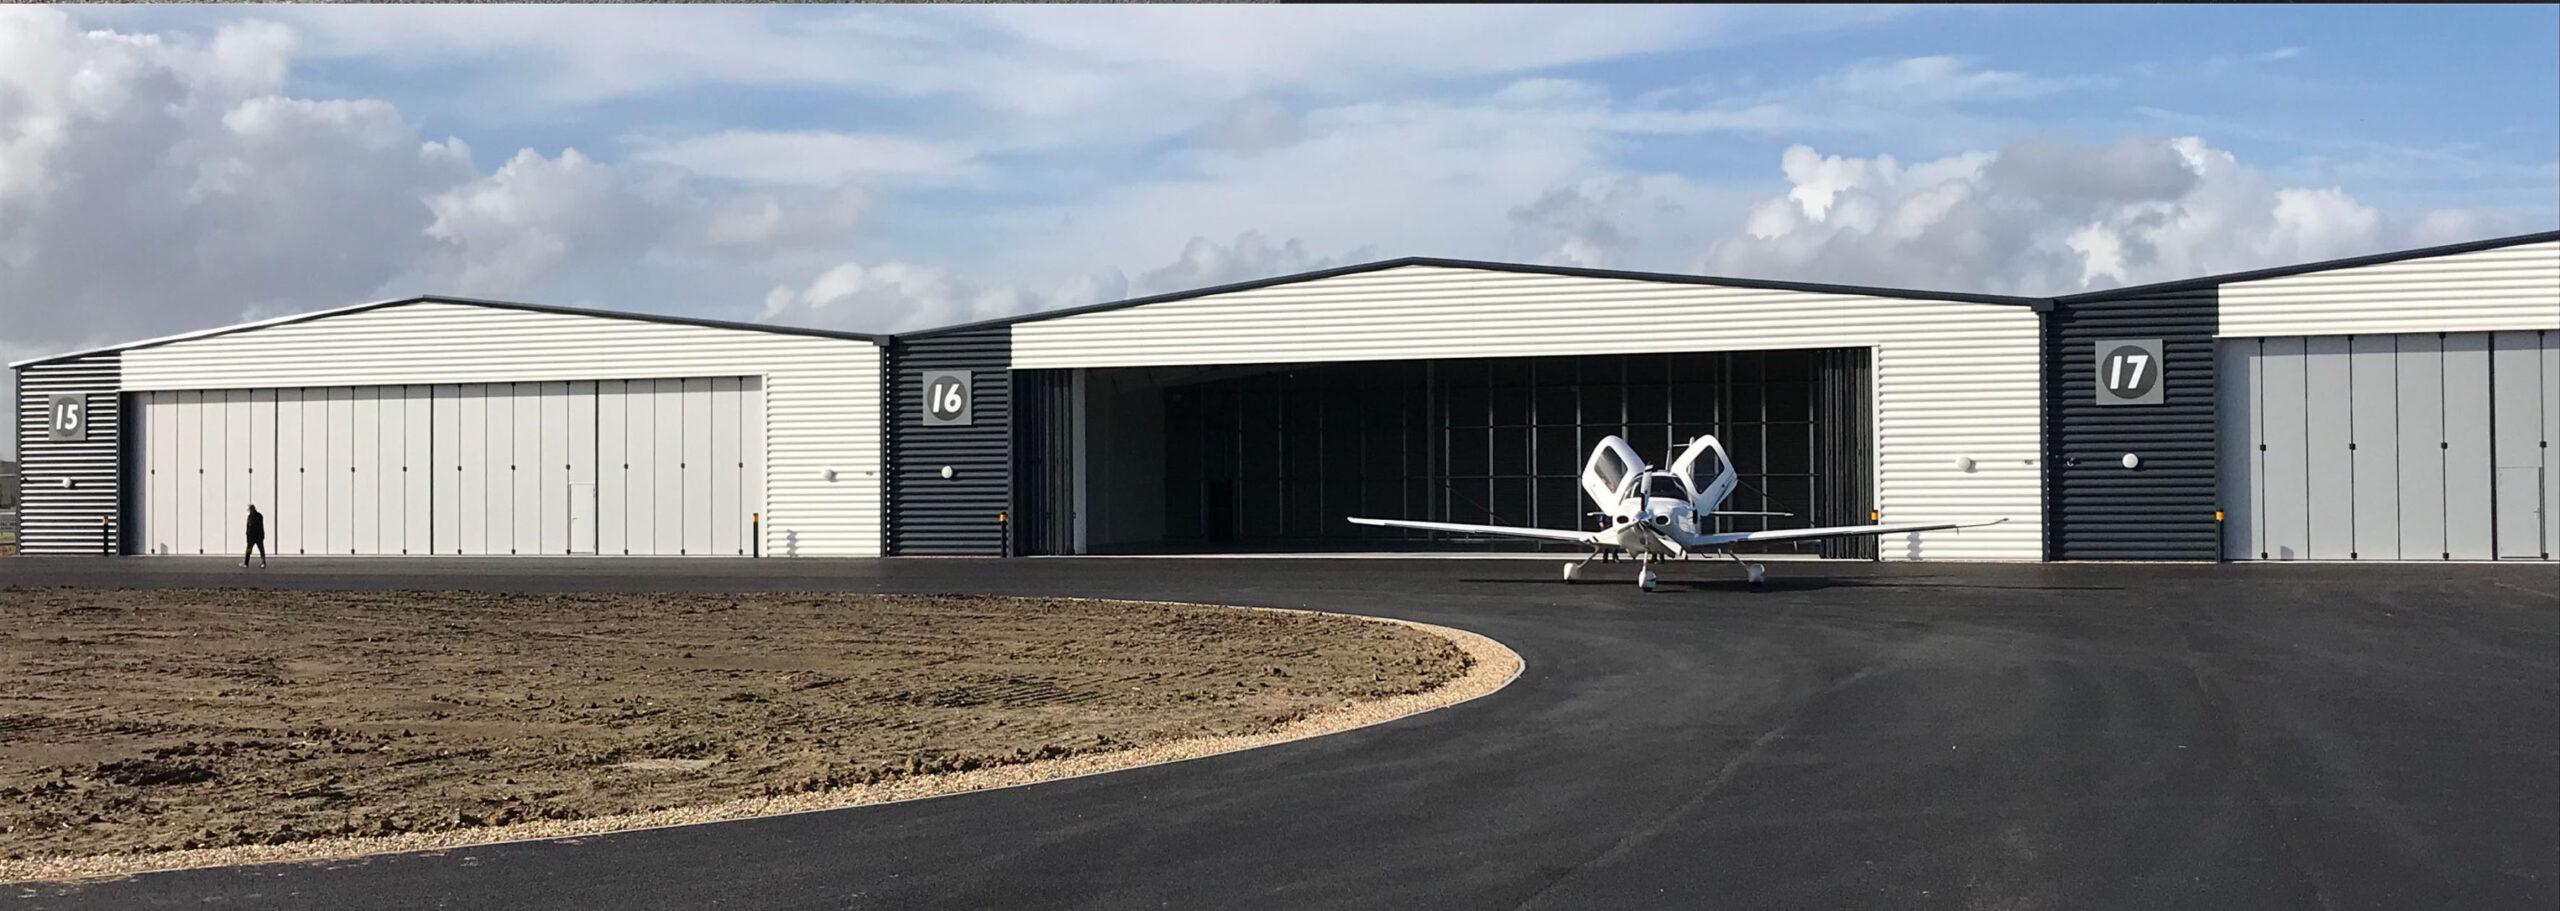 Former Daedalus site in Hampshire, Solent Airport – Eleven Osprey sliding folding doors – Five General Aviation Hangars – 2018